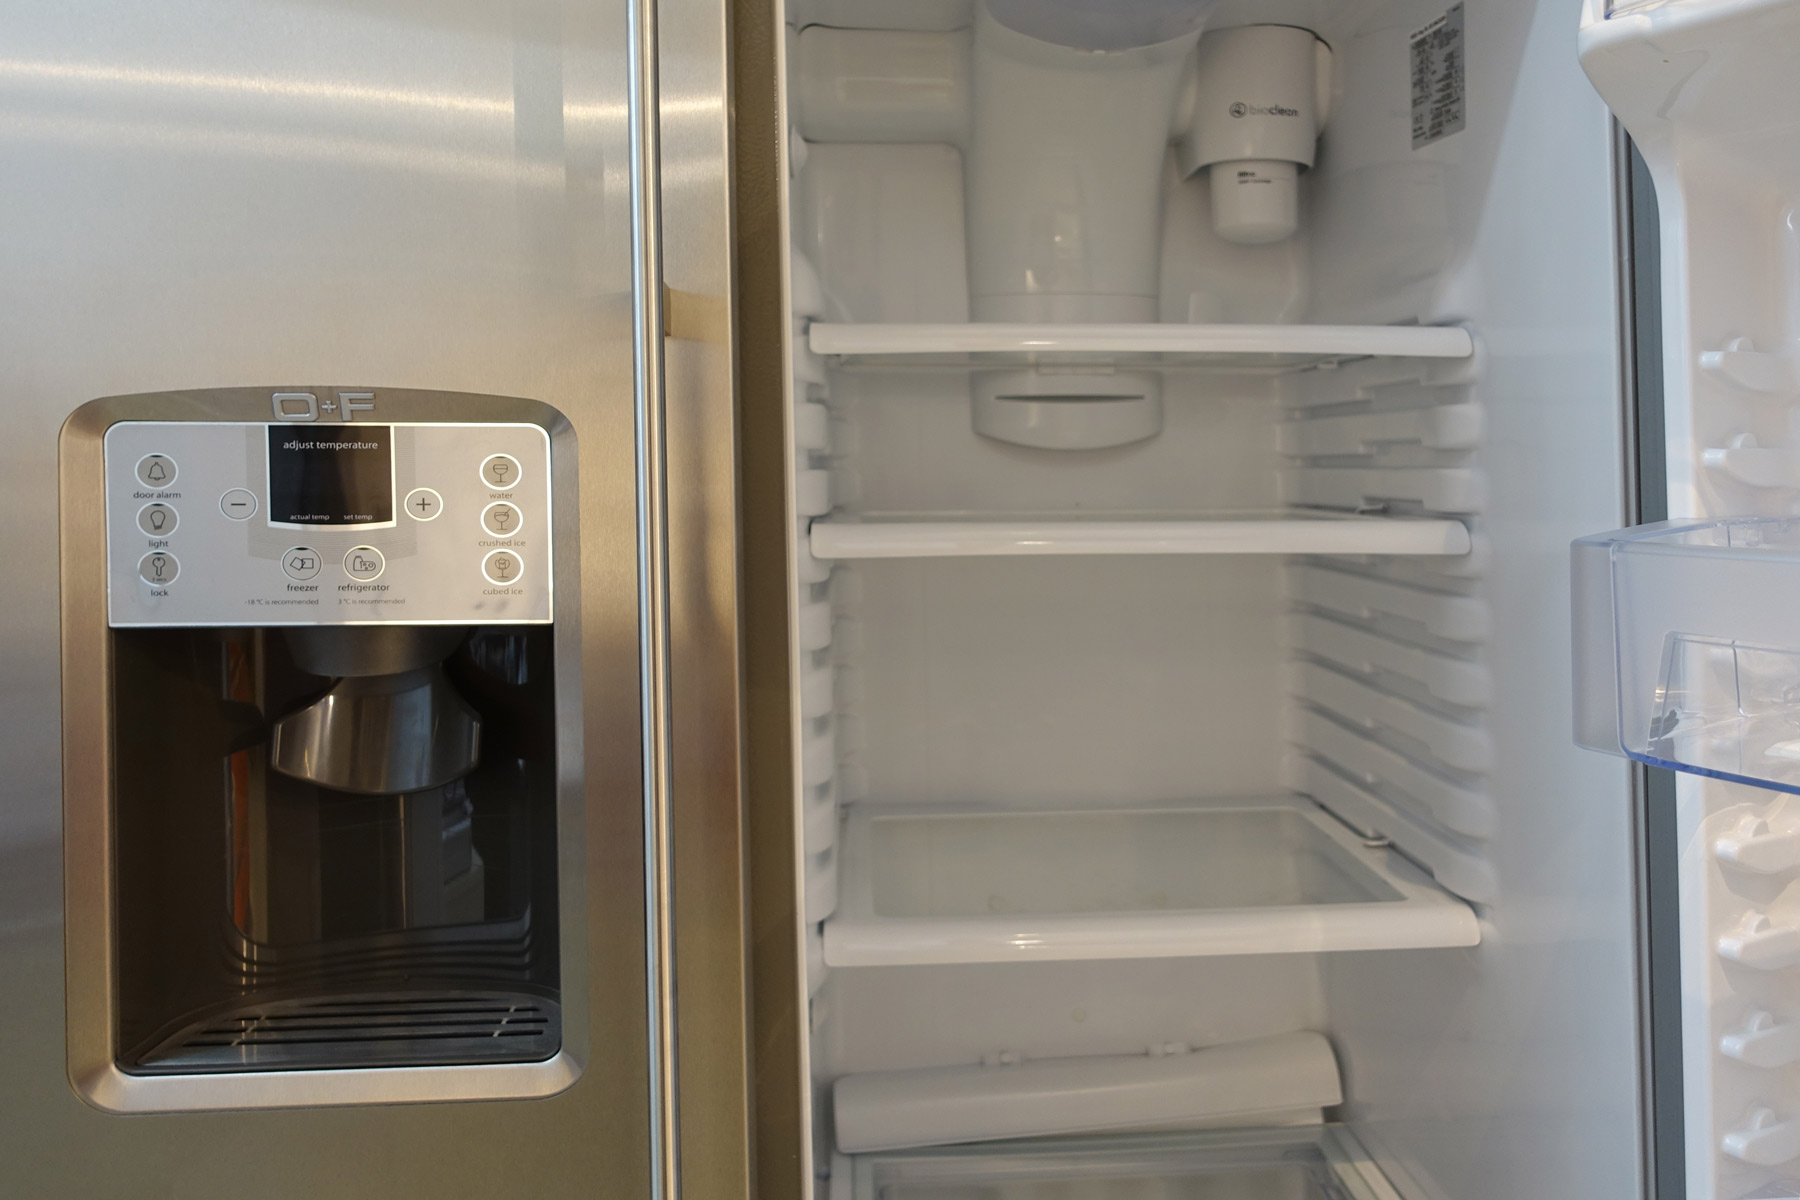 Amerikanischer Kühlschrank Edelstahl : O f classic side by side kühlschrank mit dispenser welter